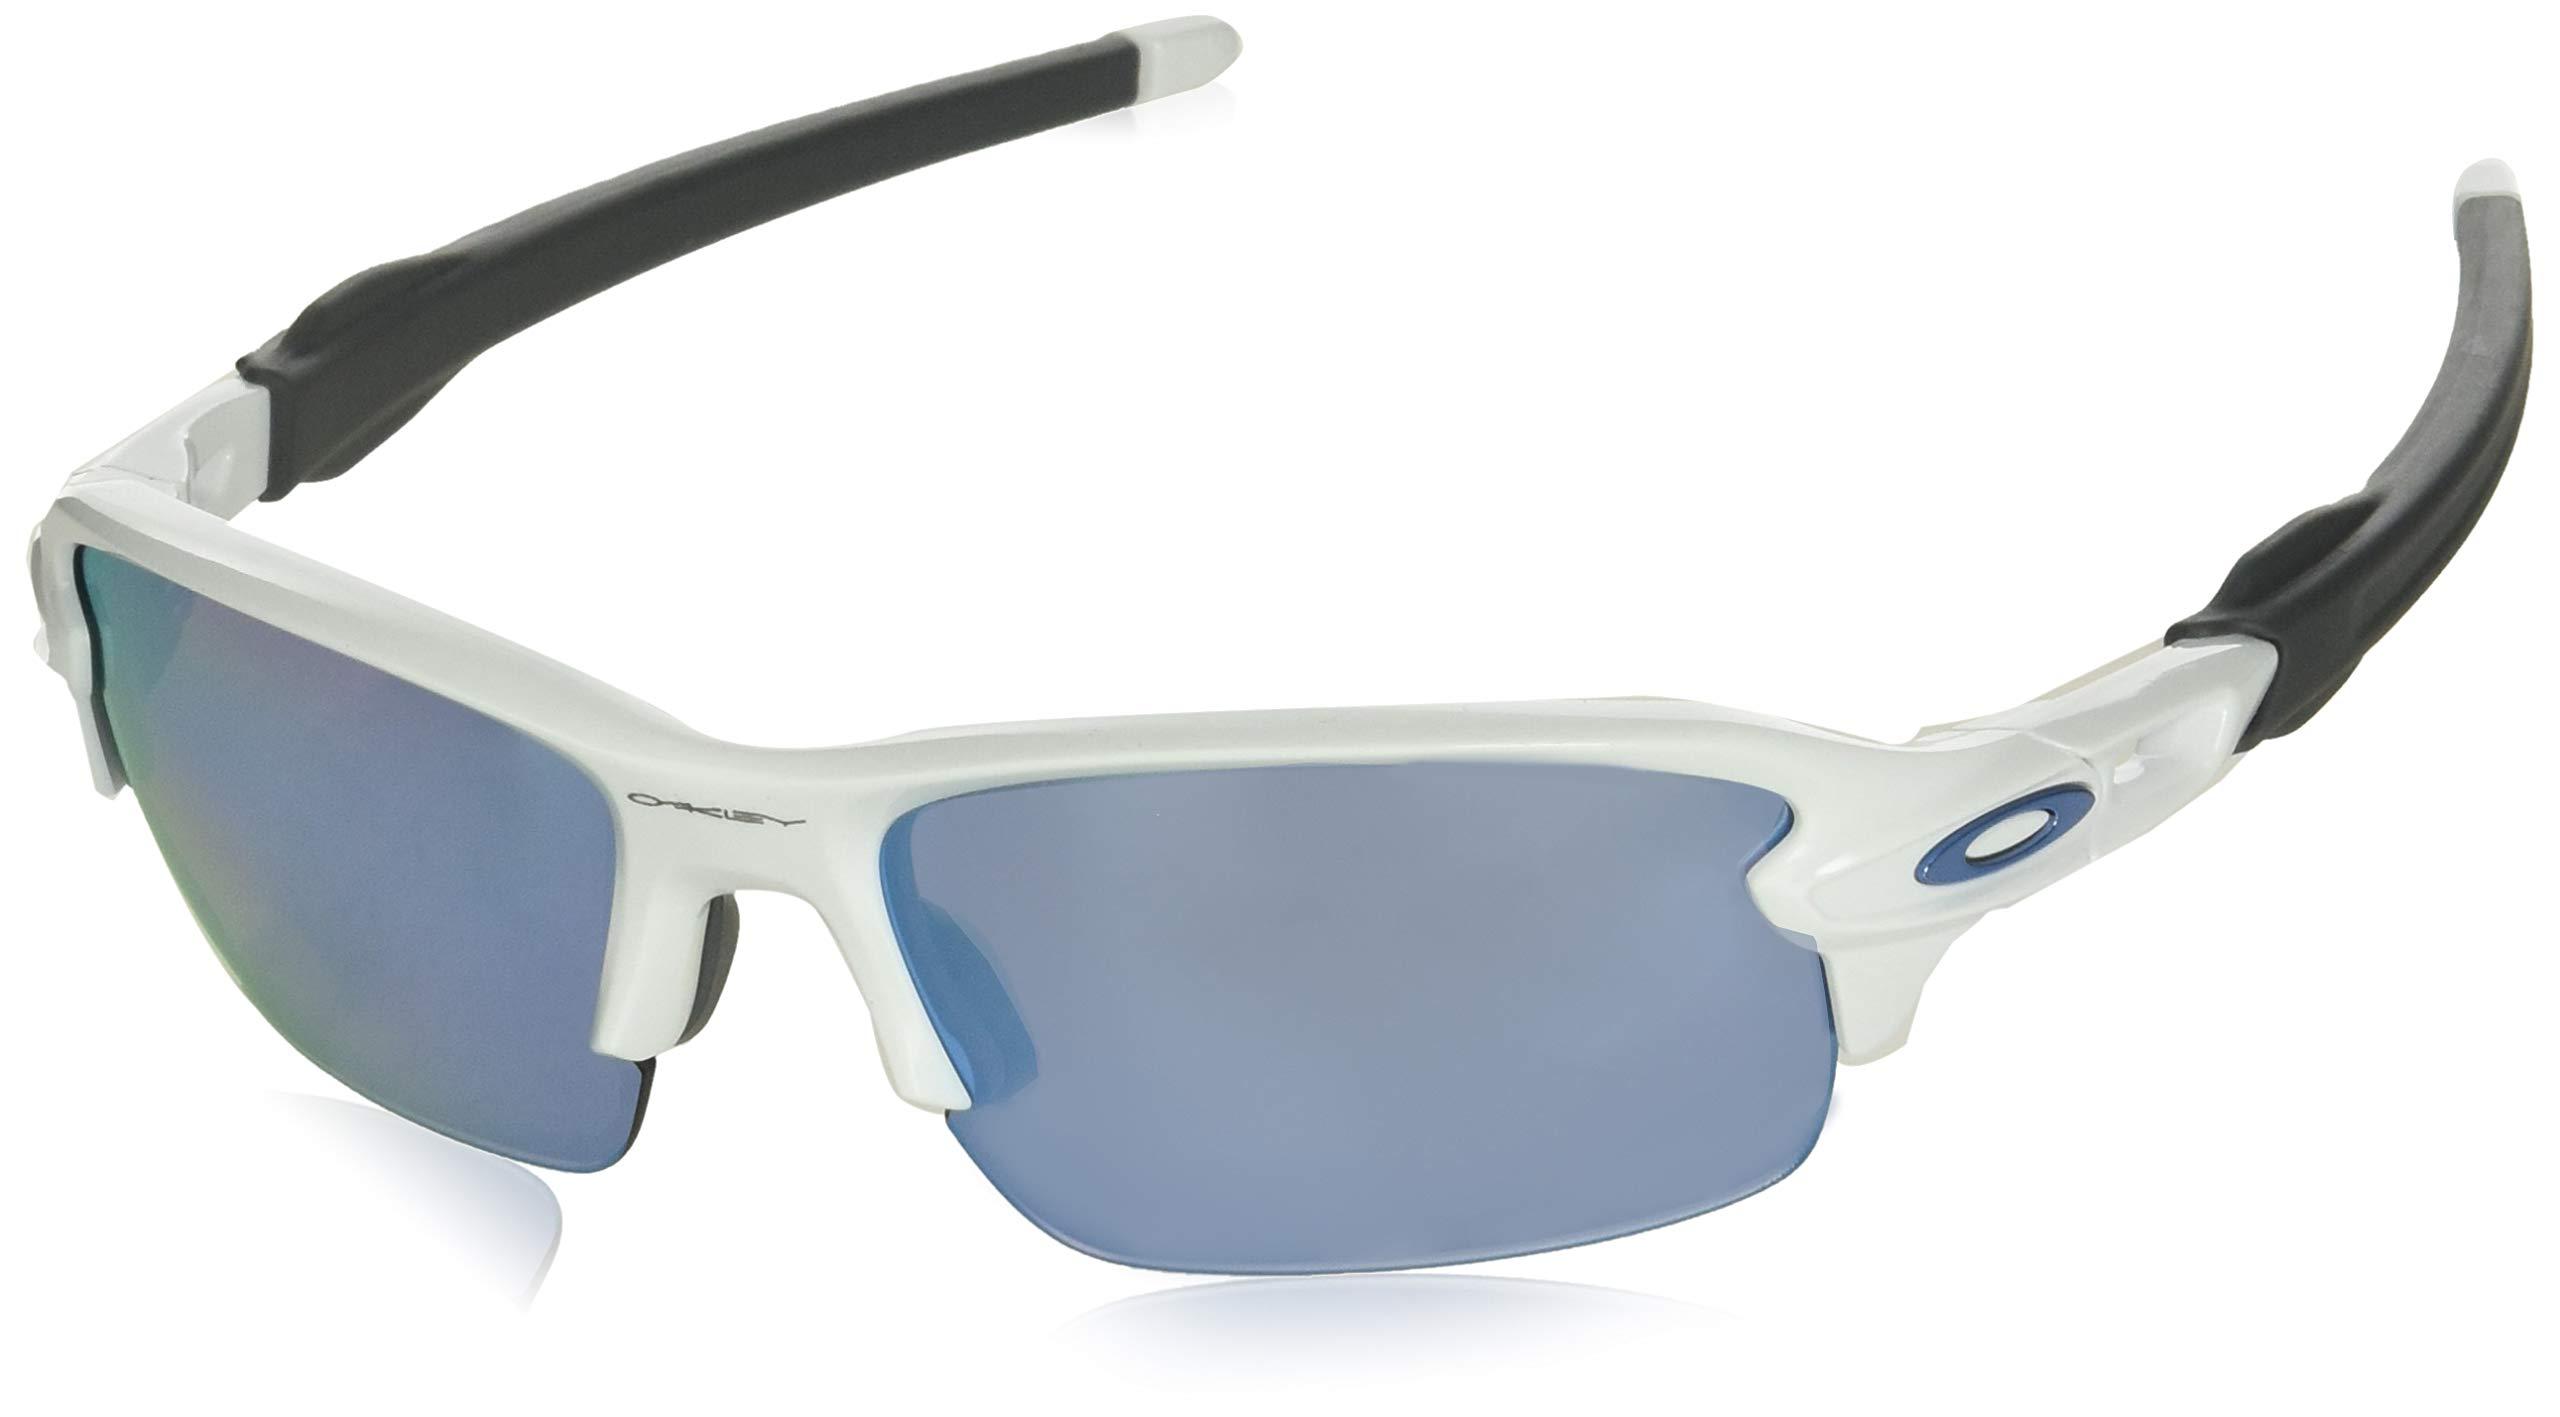 Oakley Youth Boys OJ9005 Flak XS Rectangular Sunglasses, Polished White/Prizm Deep H2O Polarized, 59 mm